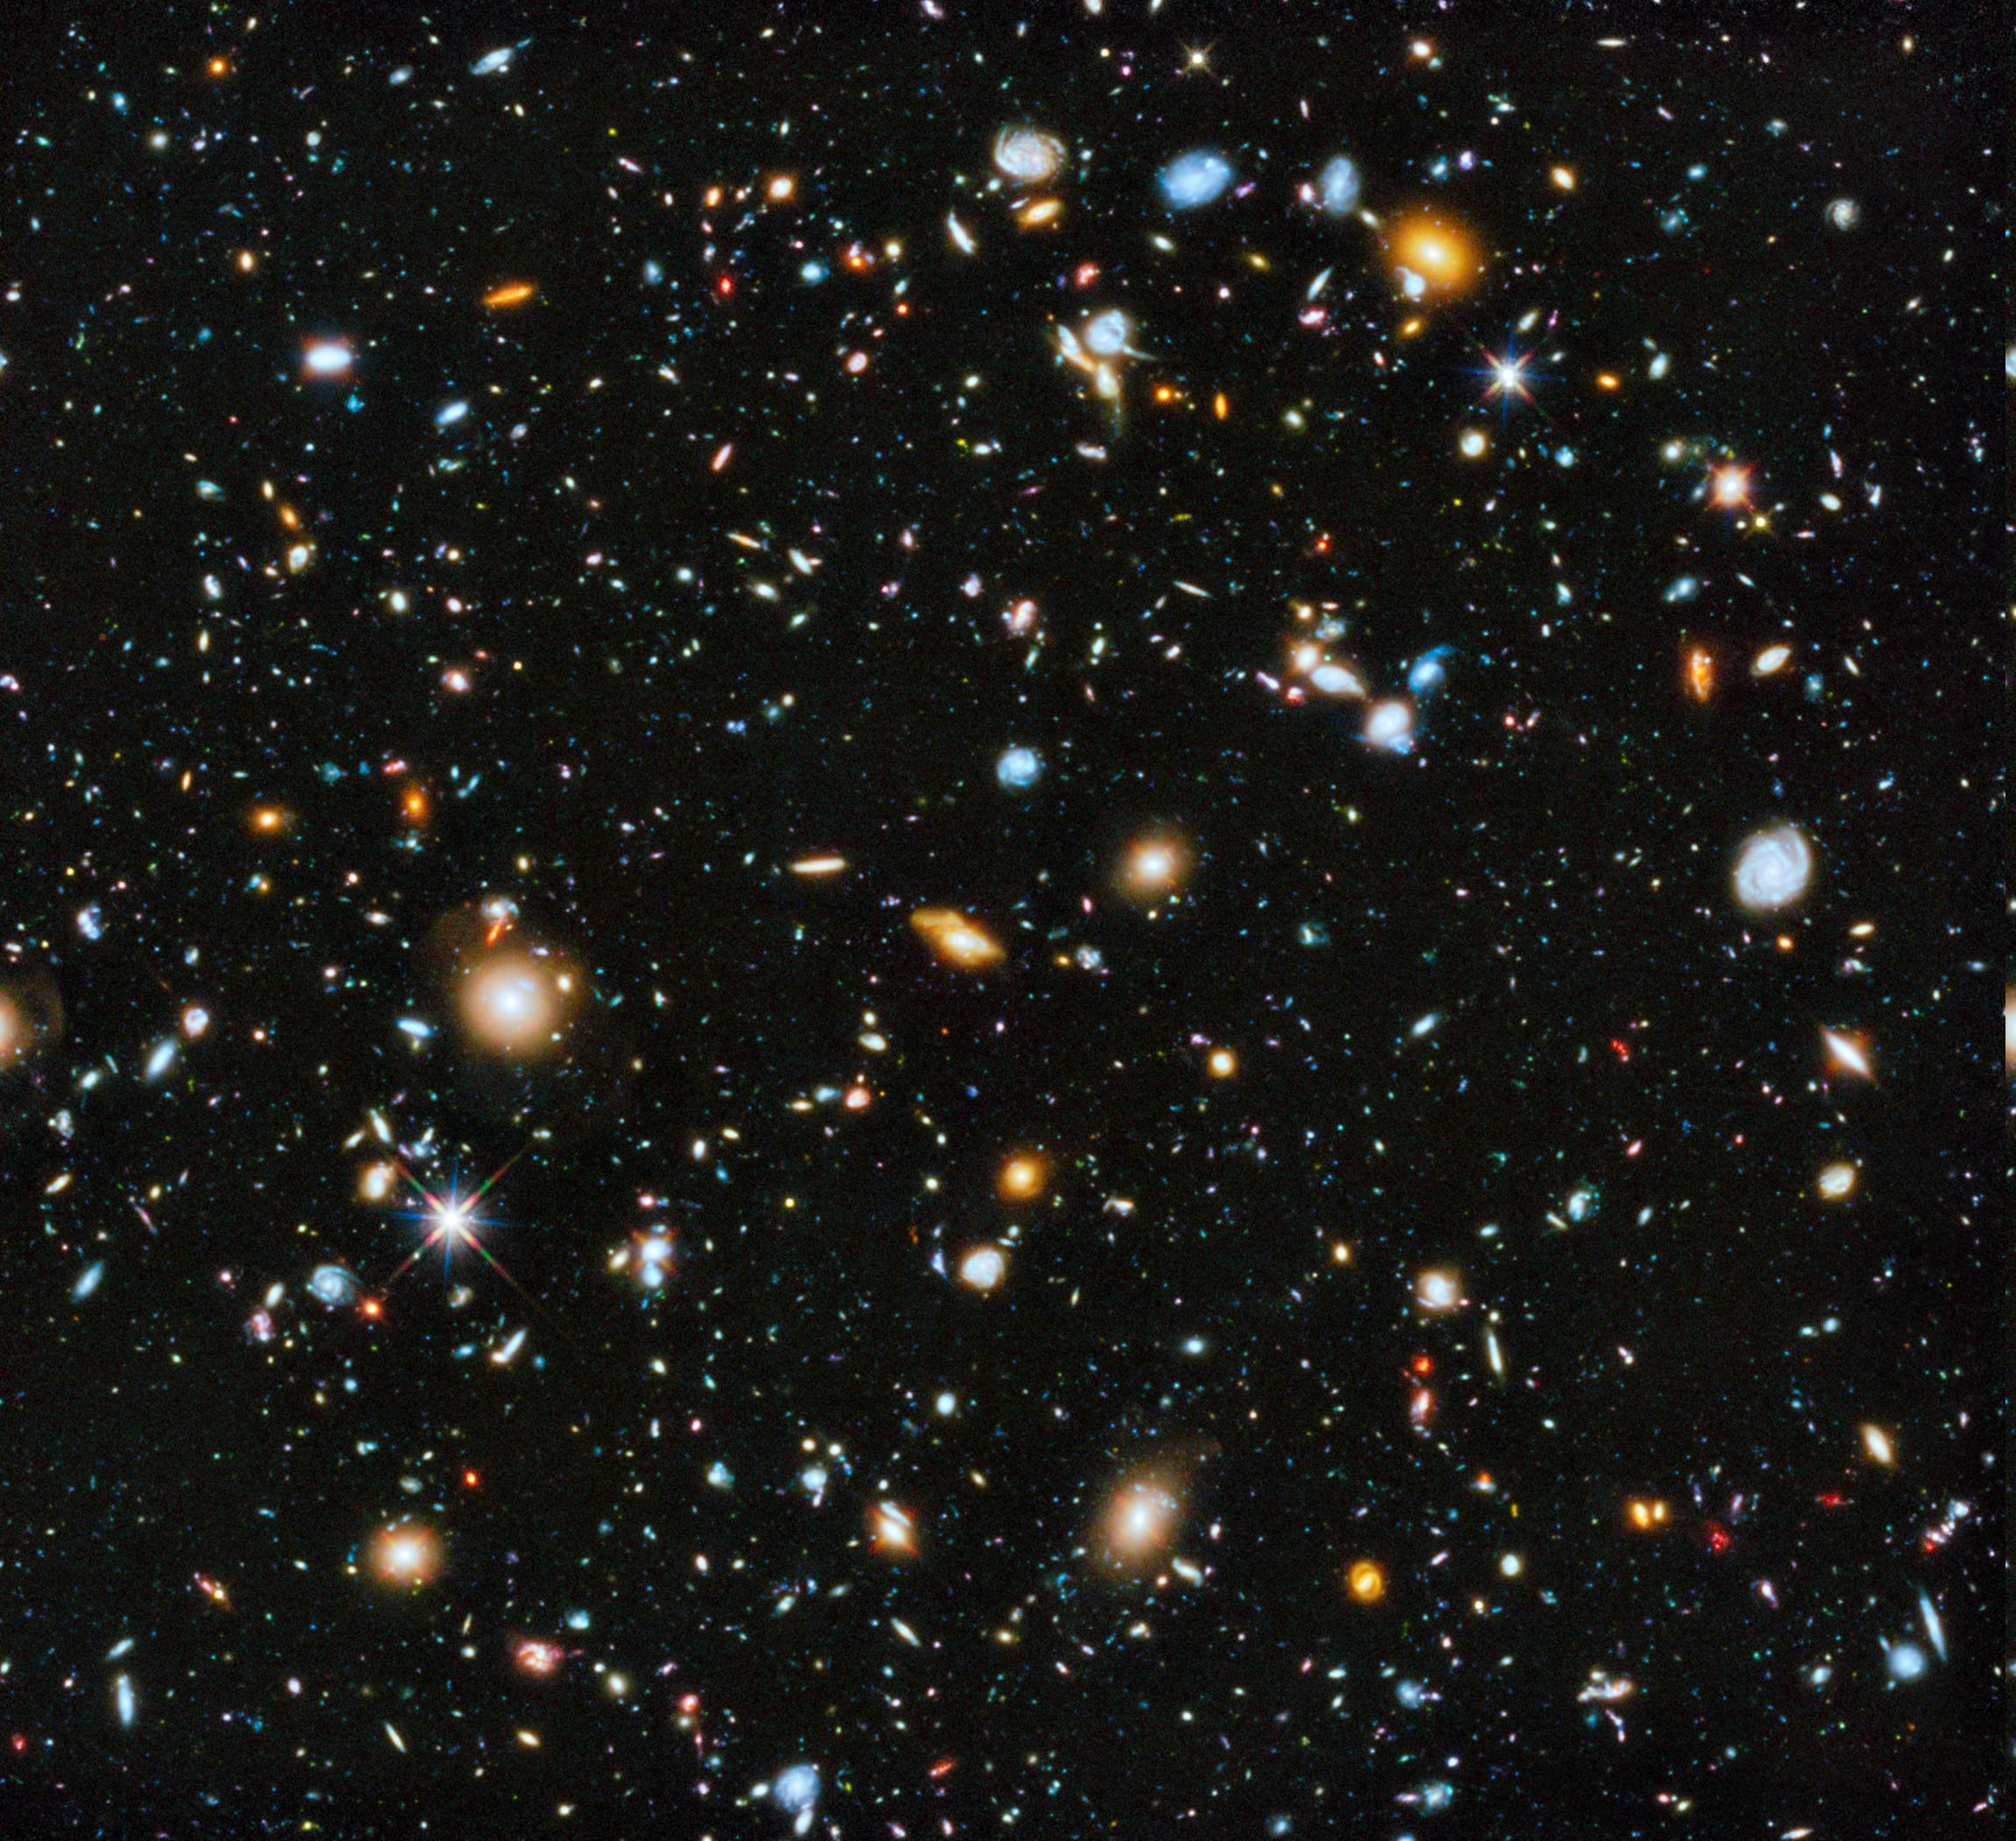 Wallpaper 2300x2100 Px Deep Space Galaxy Hubble Deep